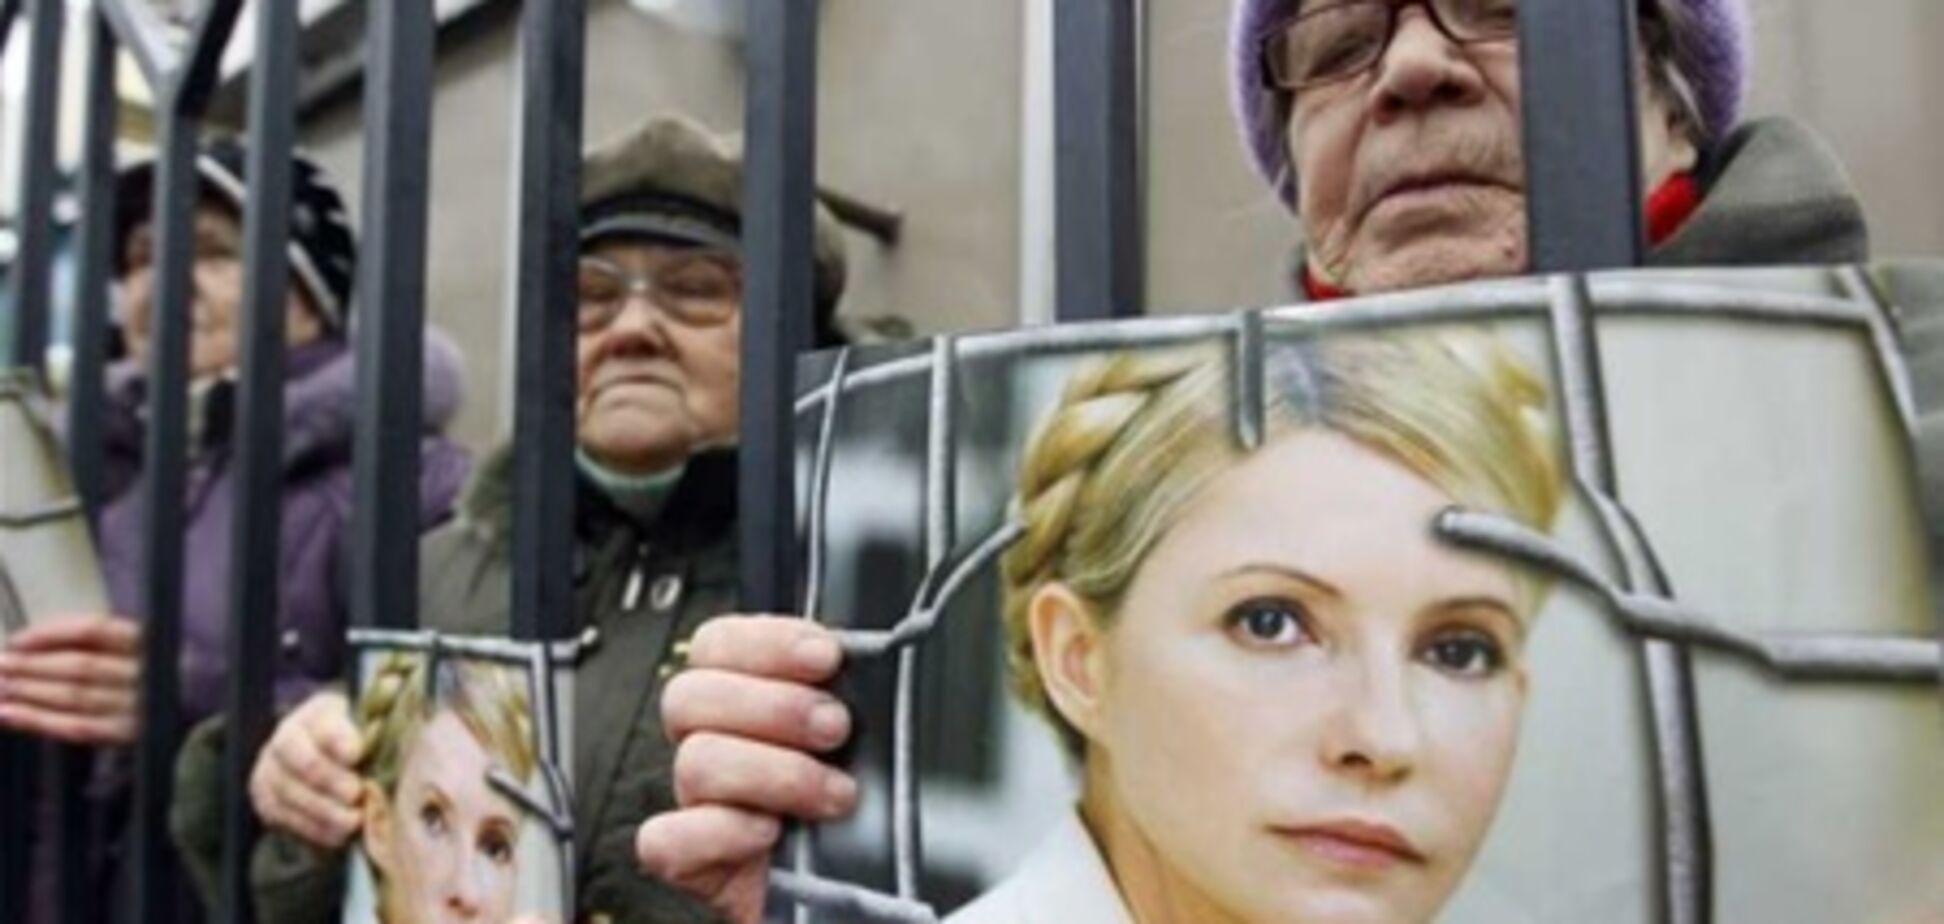 ГПС: Тимошенко етаповано законно